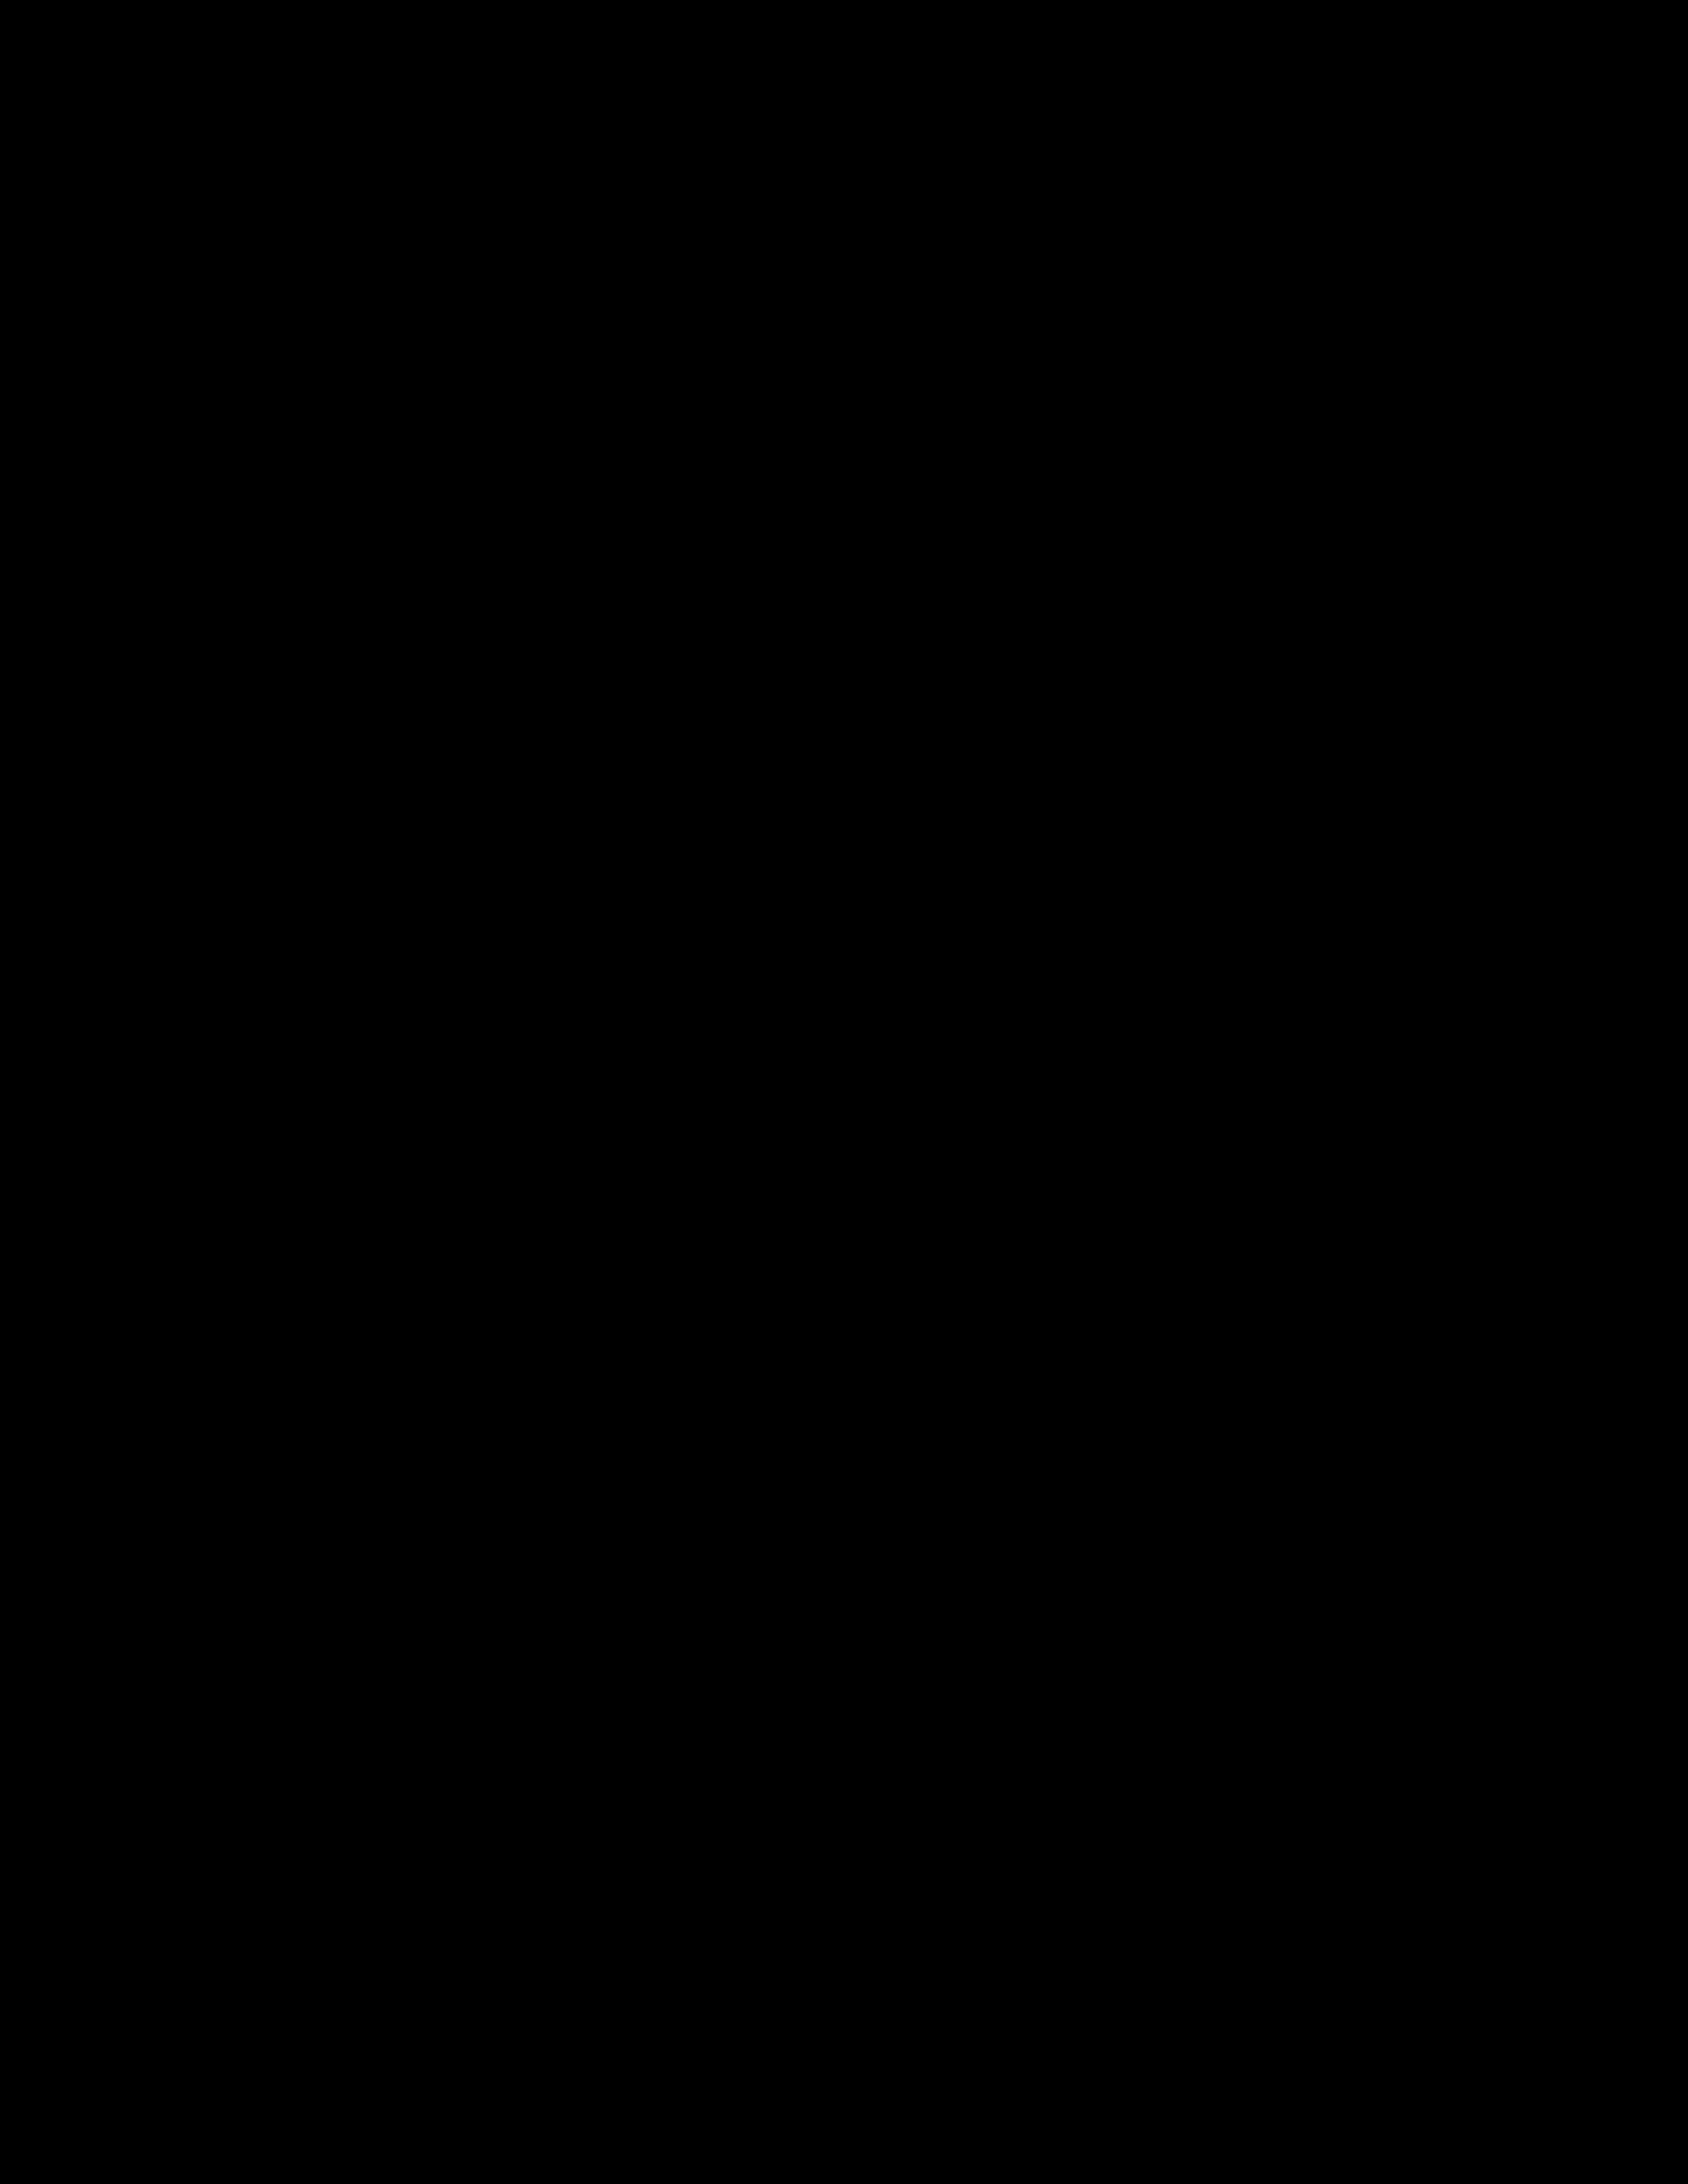 basic job acceptance letter main image